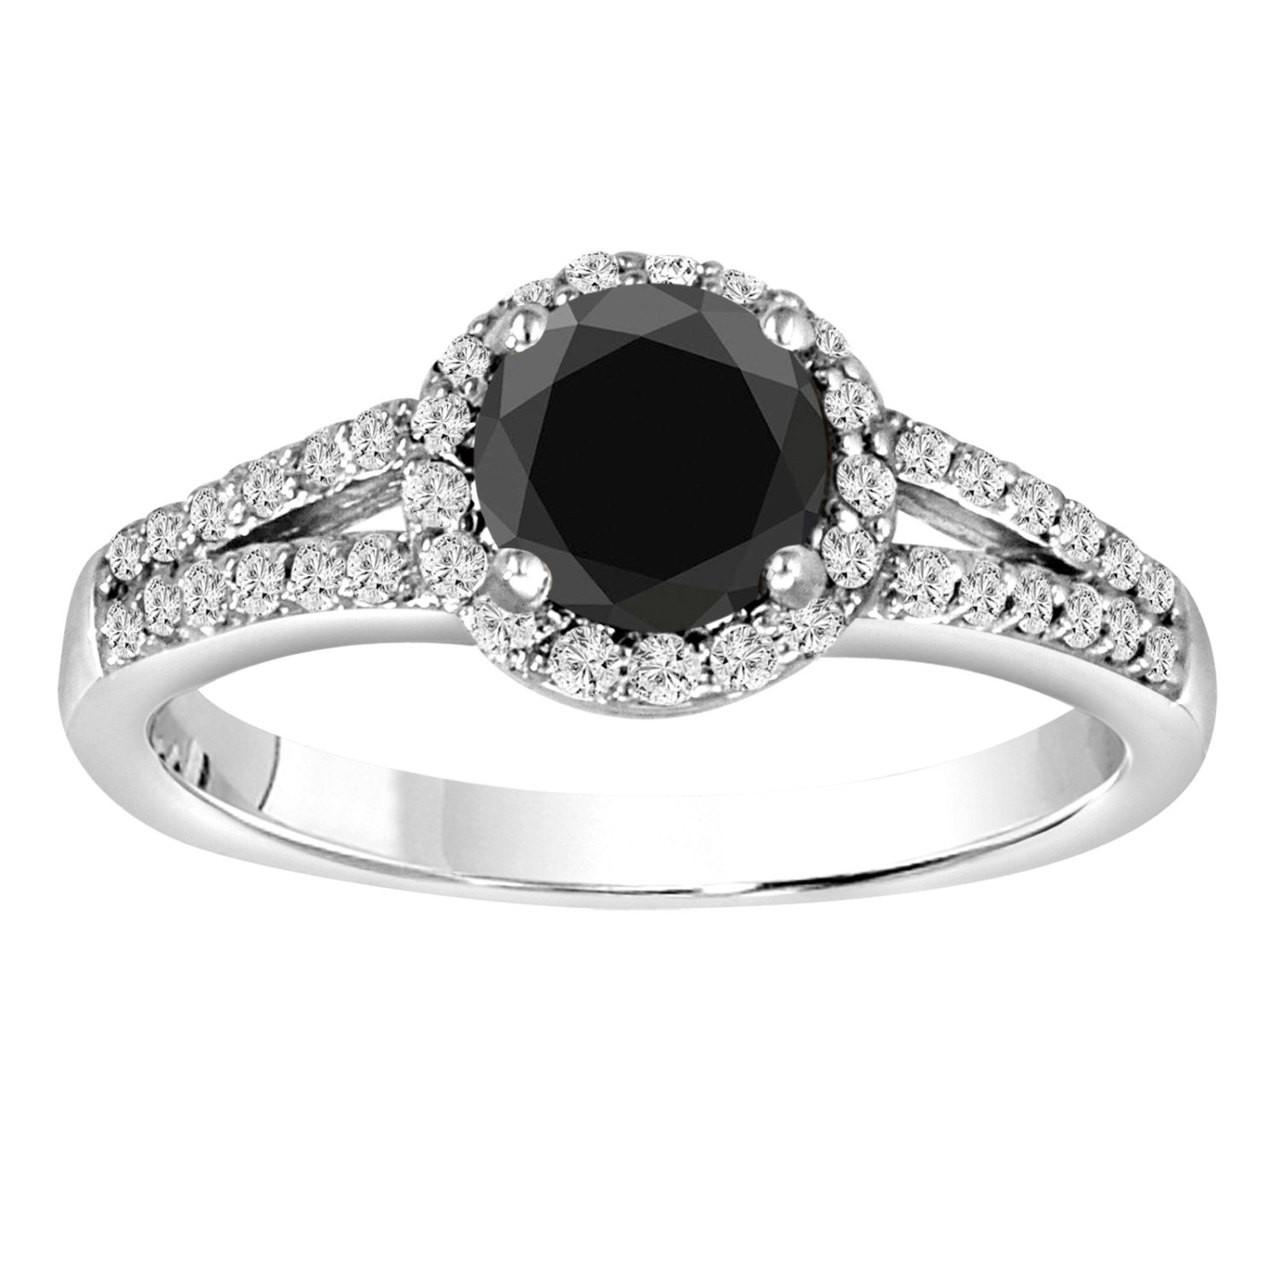 Fancy Black Diamond Engagement Ring 14K White Gold Halo 1 ...